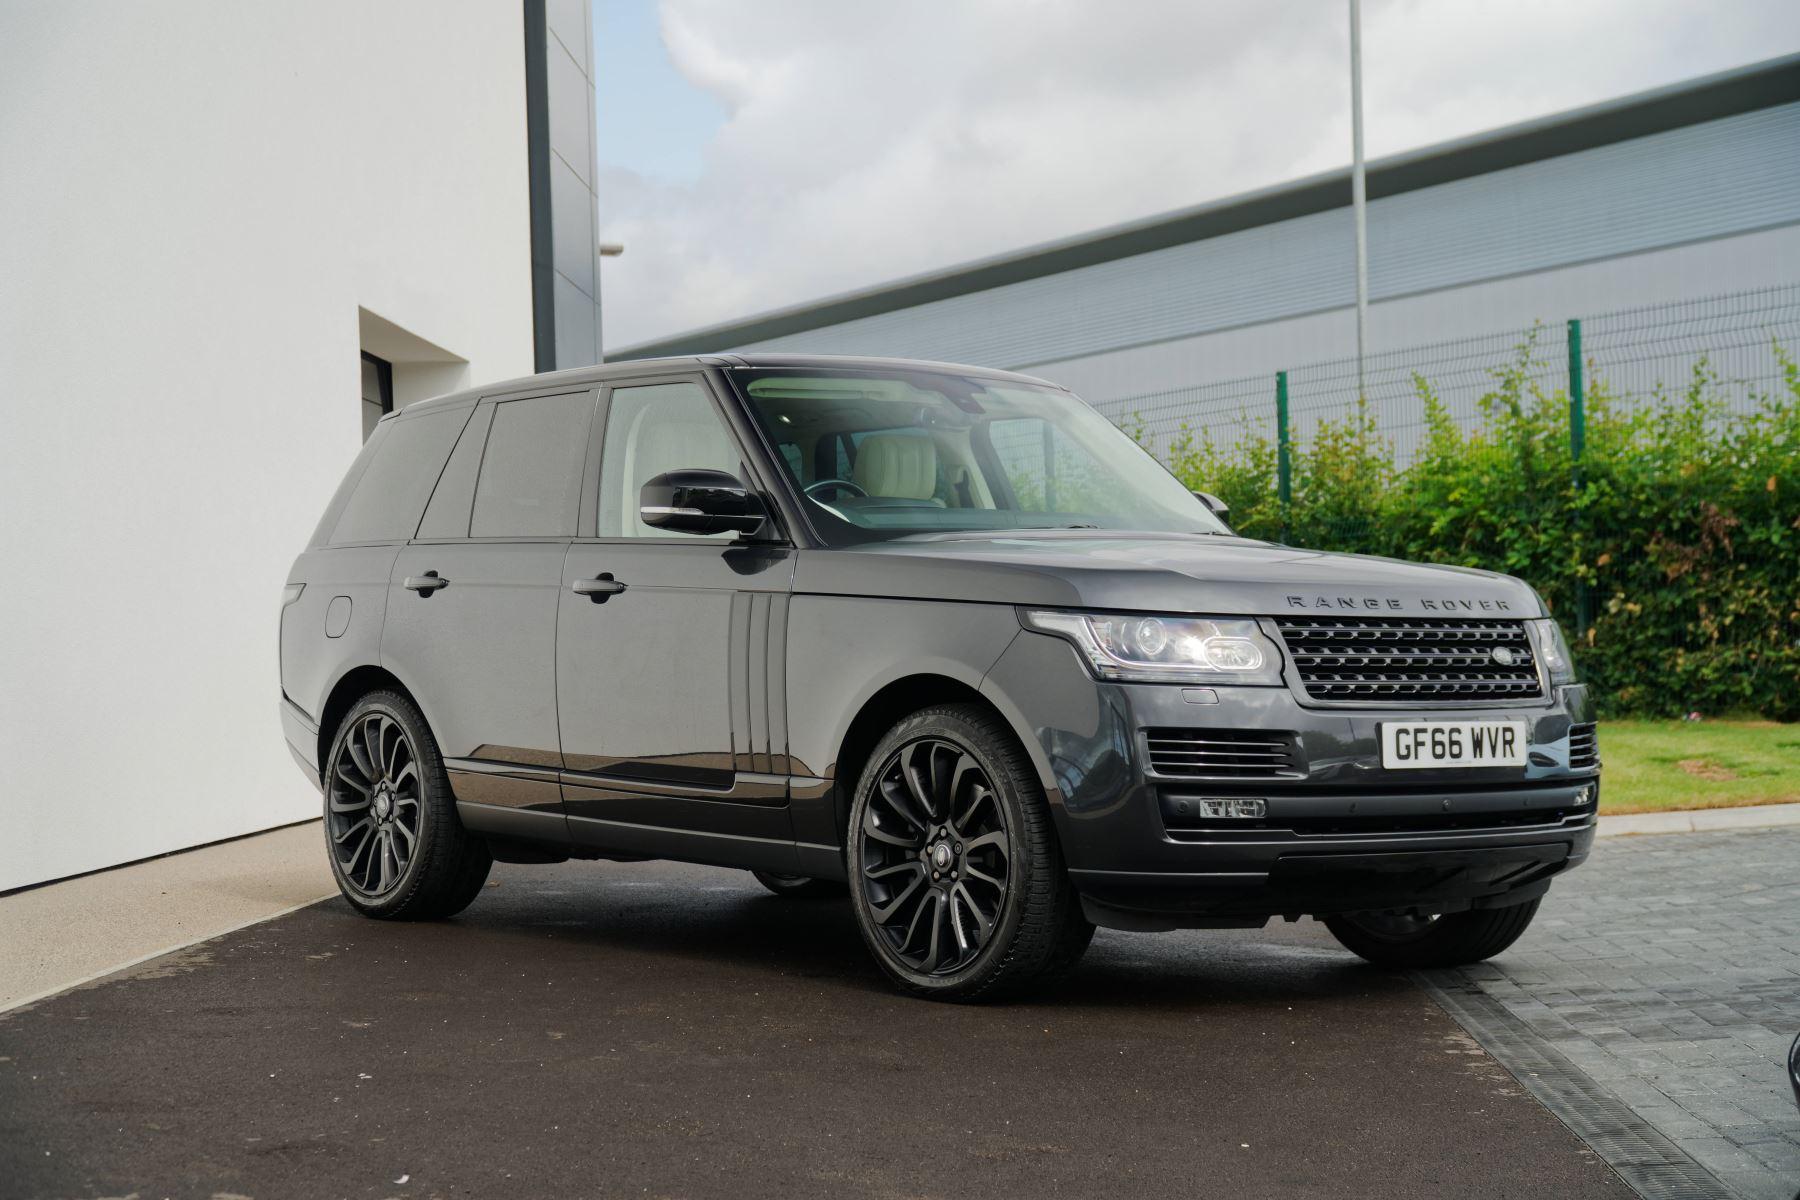 Land Rover Range Rover  SDV8 Autobiography Diesel Semi-Automatic 4 door 4x4 (22/10/2016)